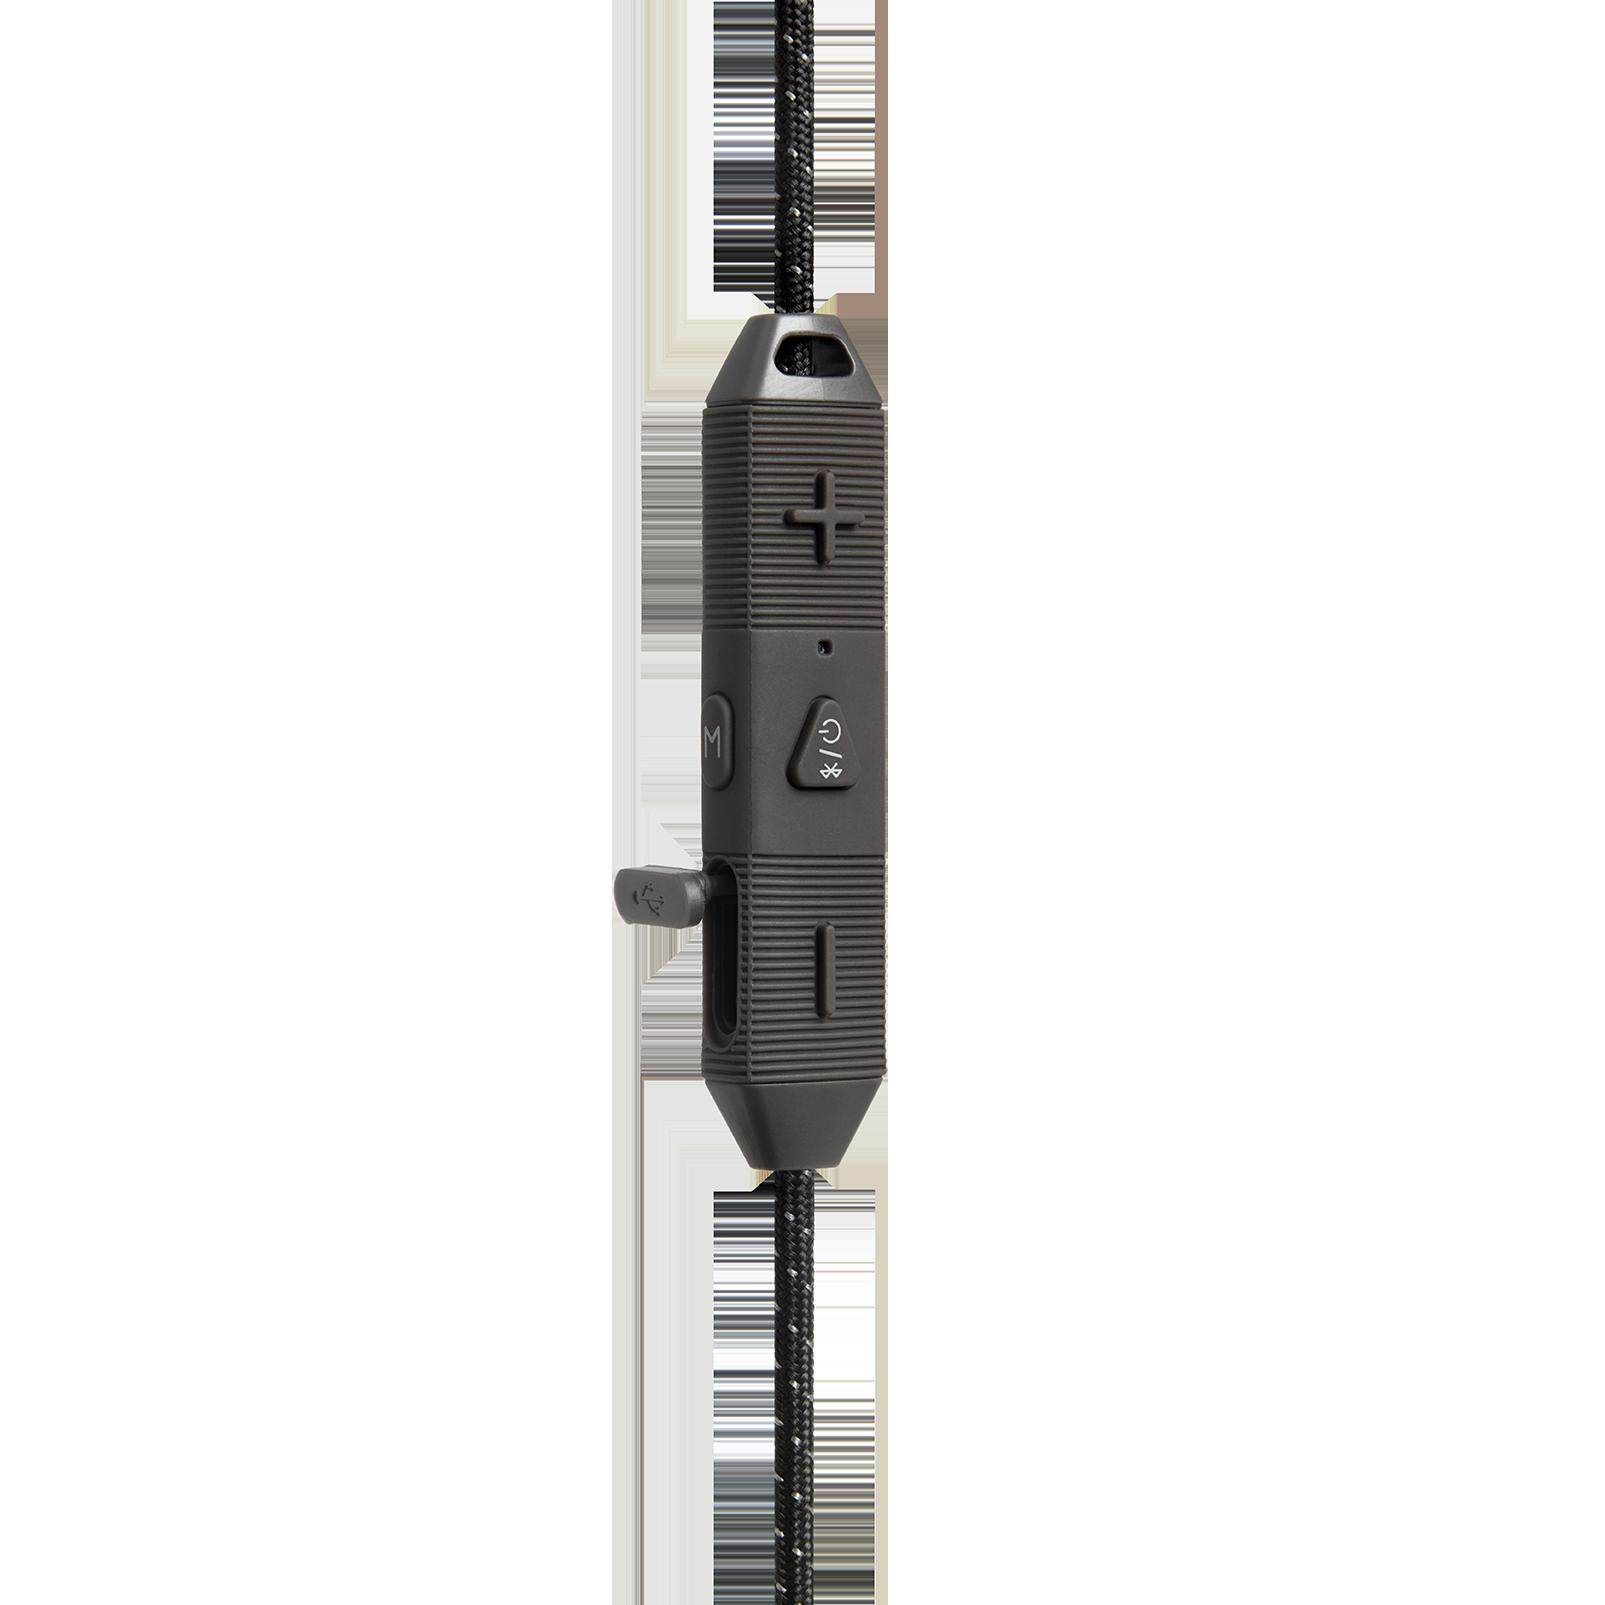 UA Sport Wireless REACT